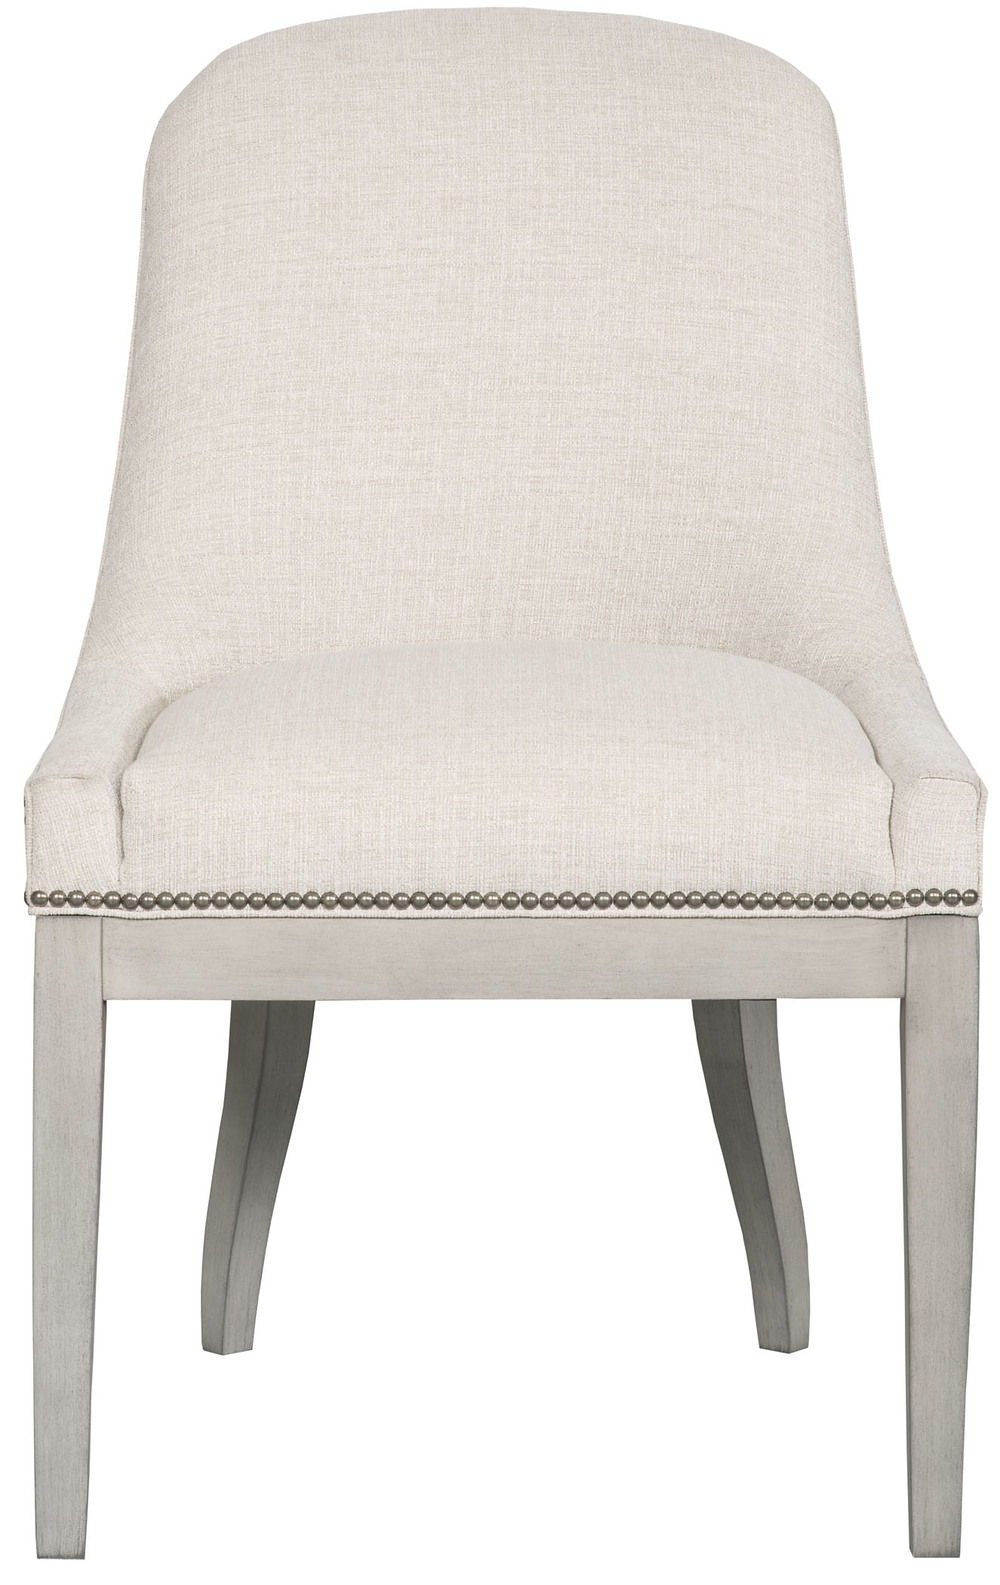 Vanguard Furniture - Calloway Side Chair